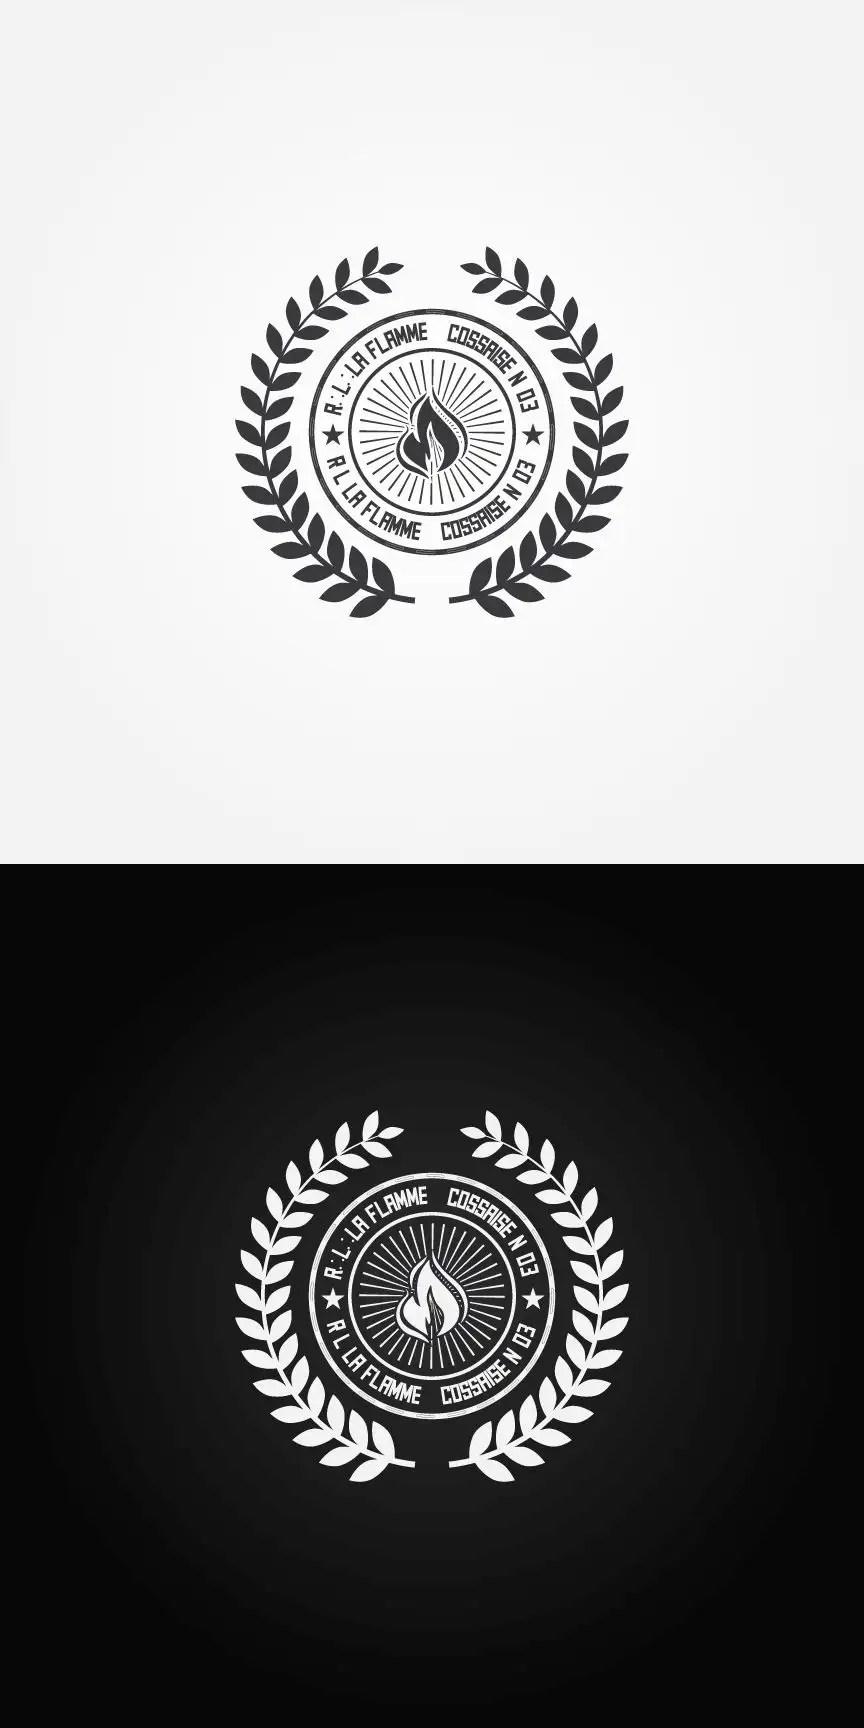 Logo Nu Hitam Putih : hitam, putih, Entry, Anikgd, Create, Masonic, Lodge, Freelancer